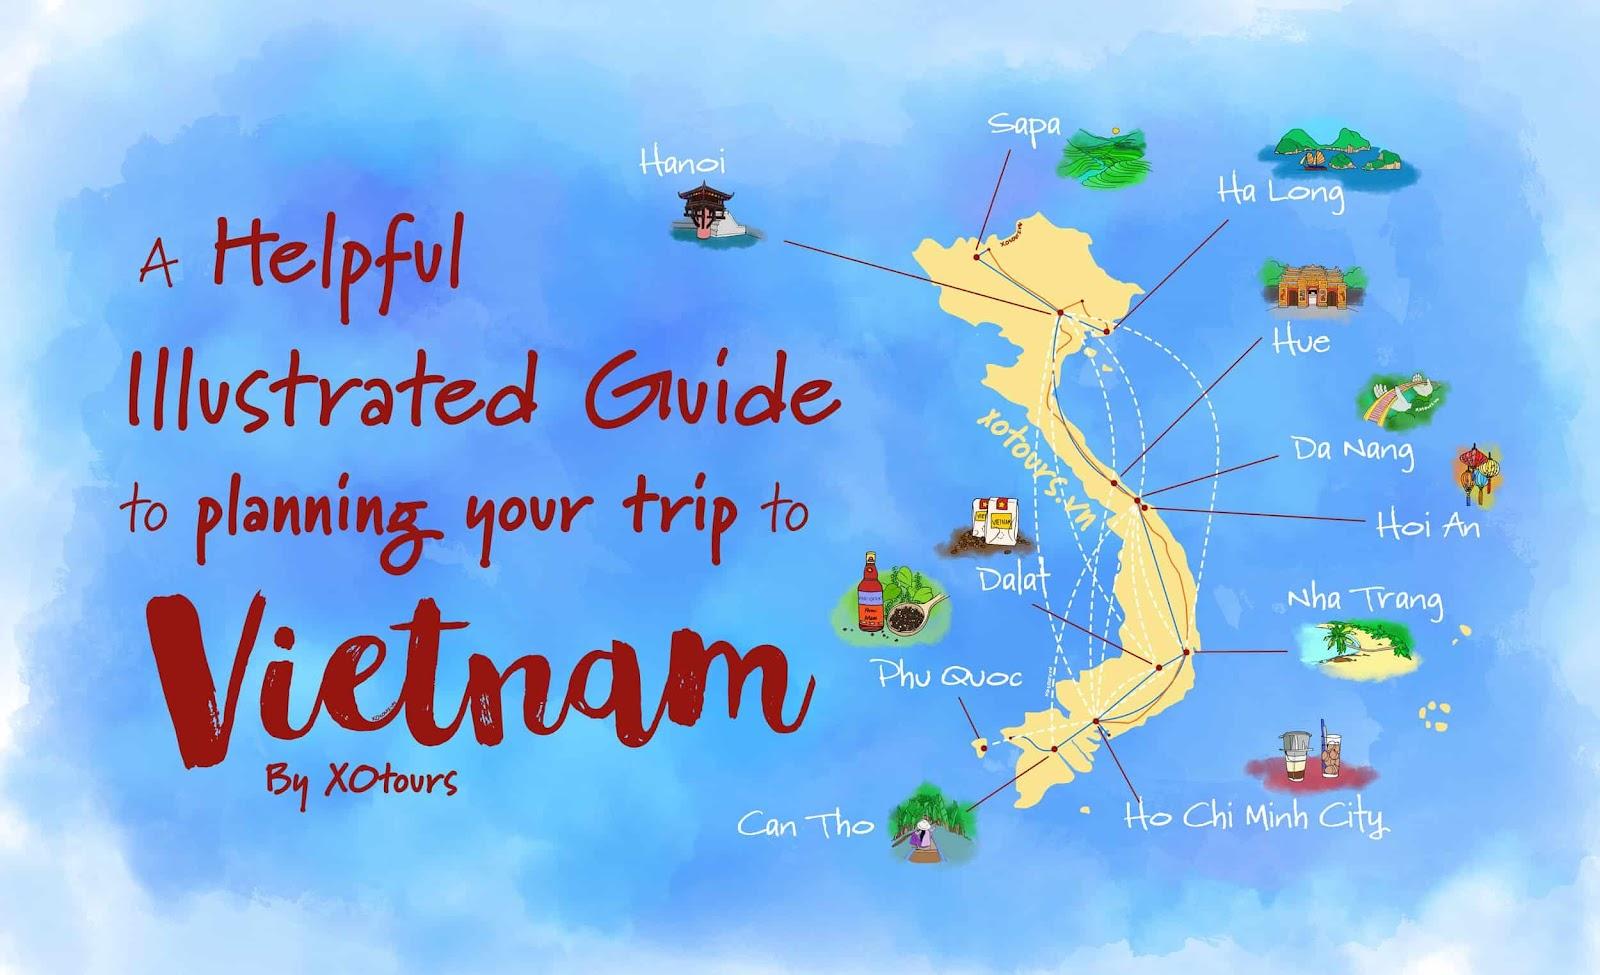 E:\SEO\seo 2020\du lich\vietbai\SeoImage\Illustrated-Guide-To-Vietnam-kavo-travel.jpg